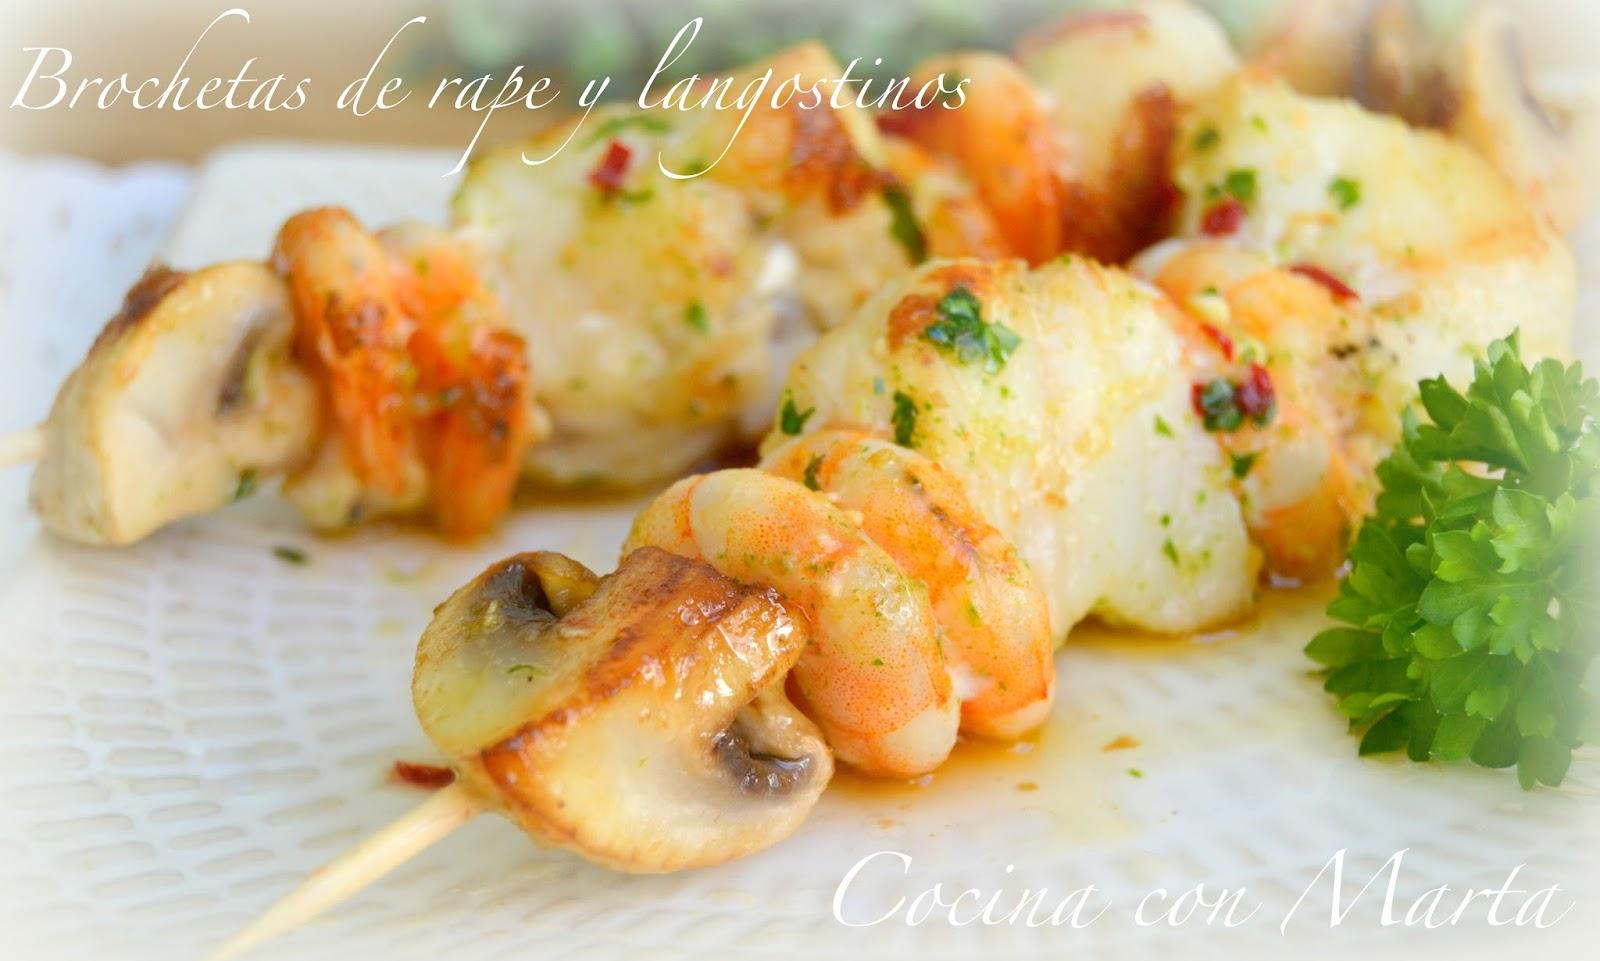 Brocheta de rape, langostinos, gambas, champiñones con vinagreta o aliño de aceite de oliva, ajo y guindilla